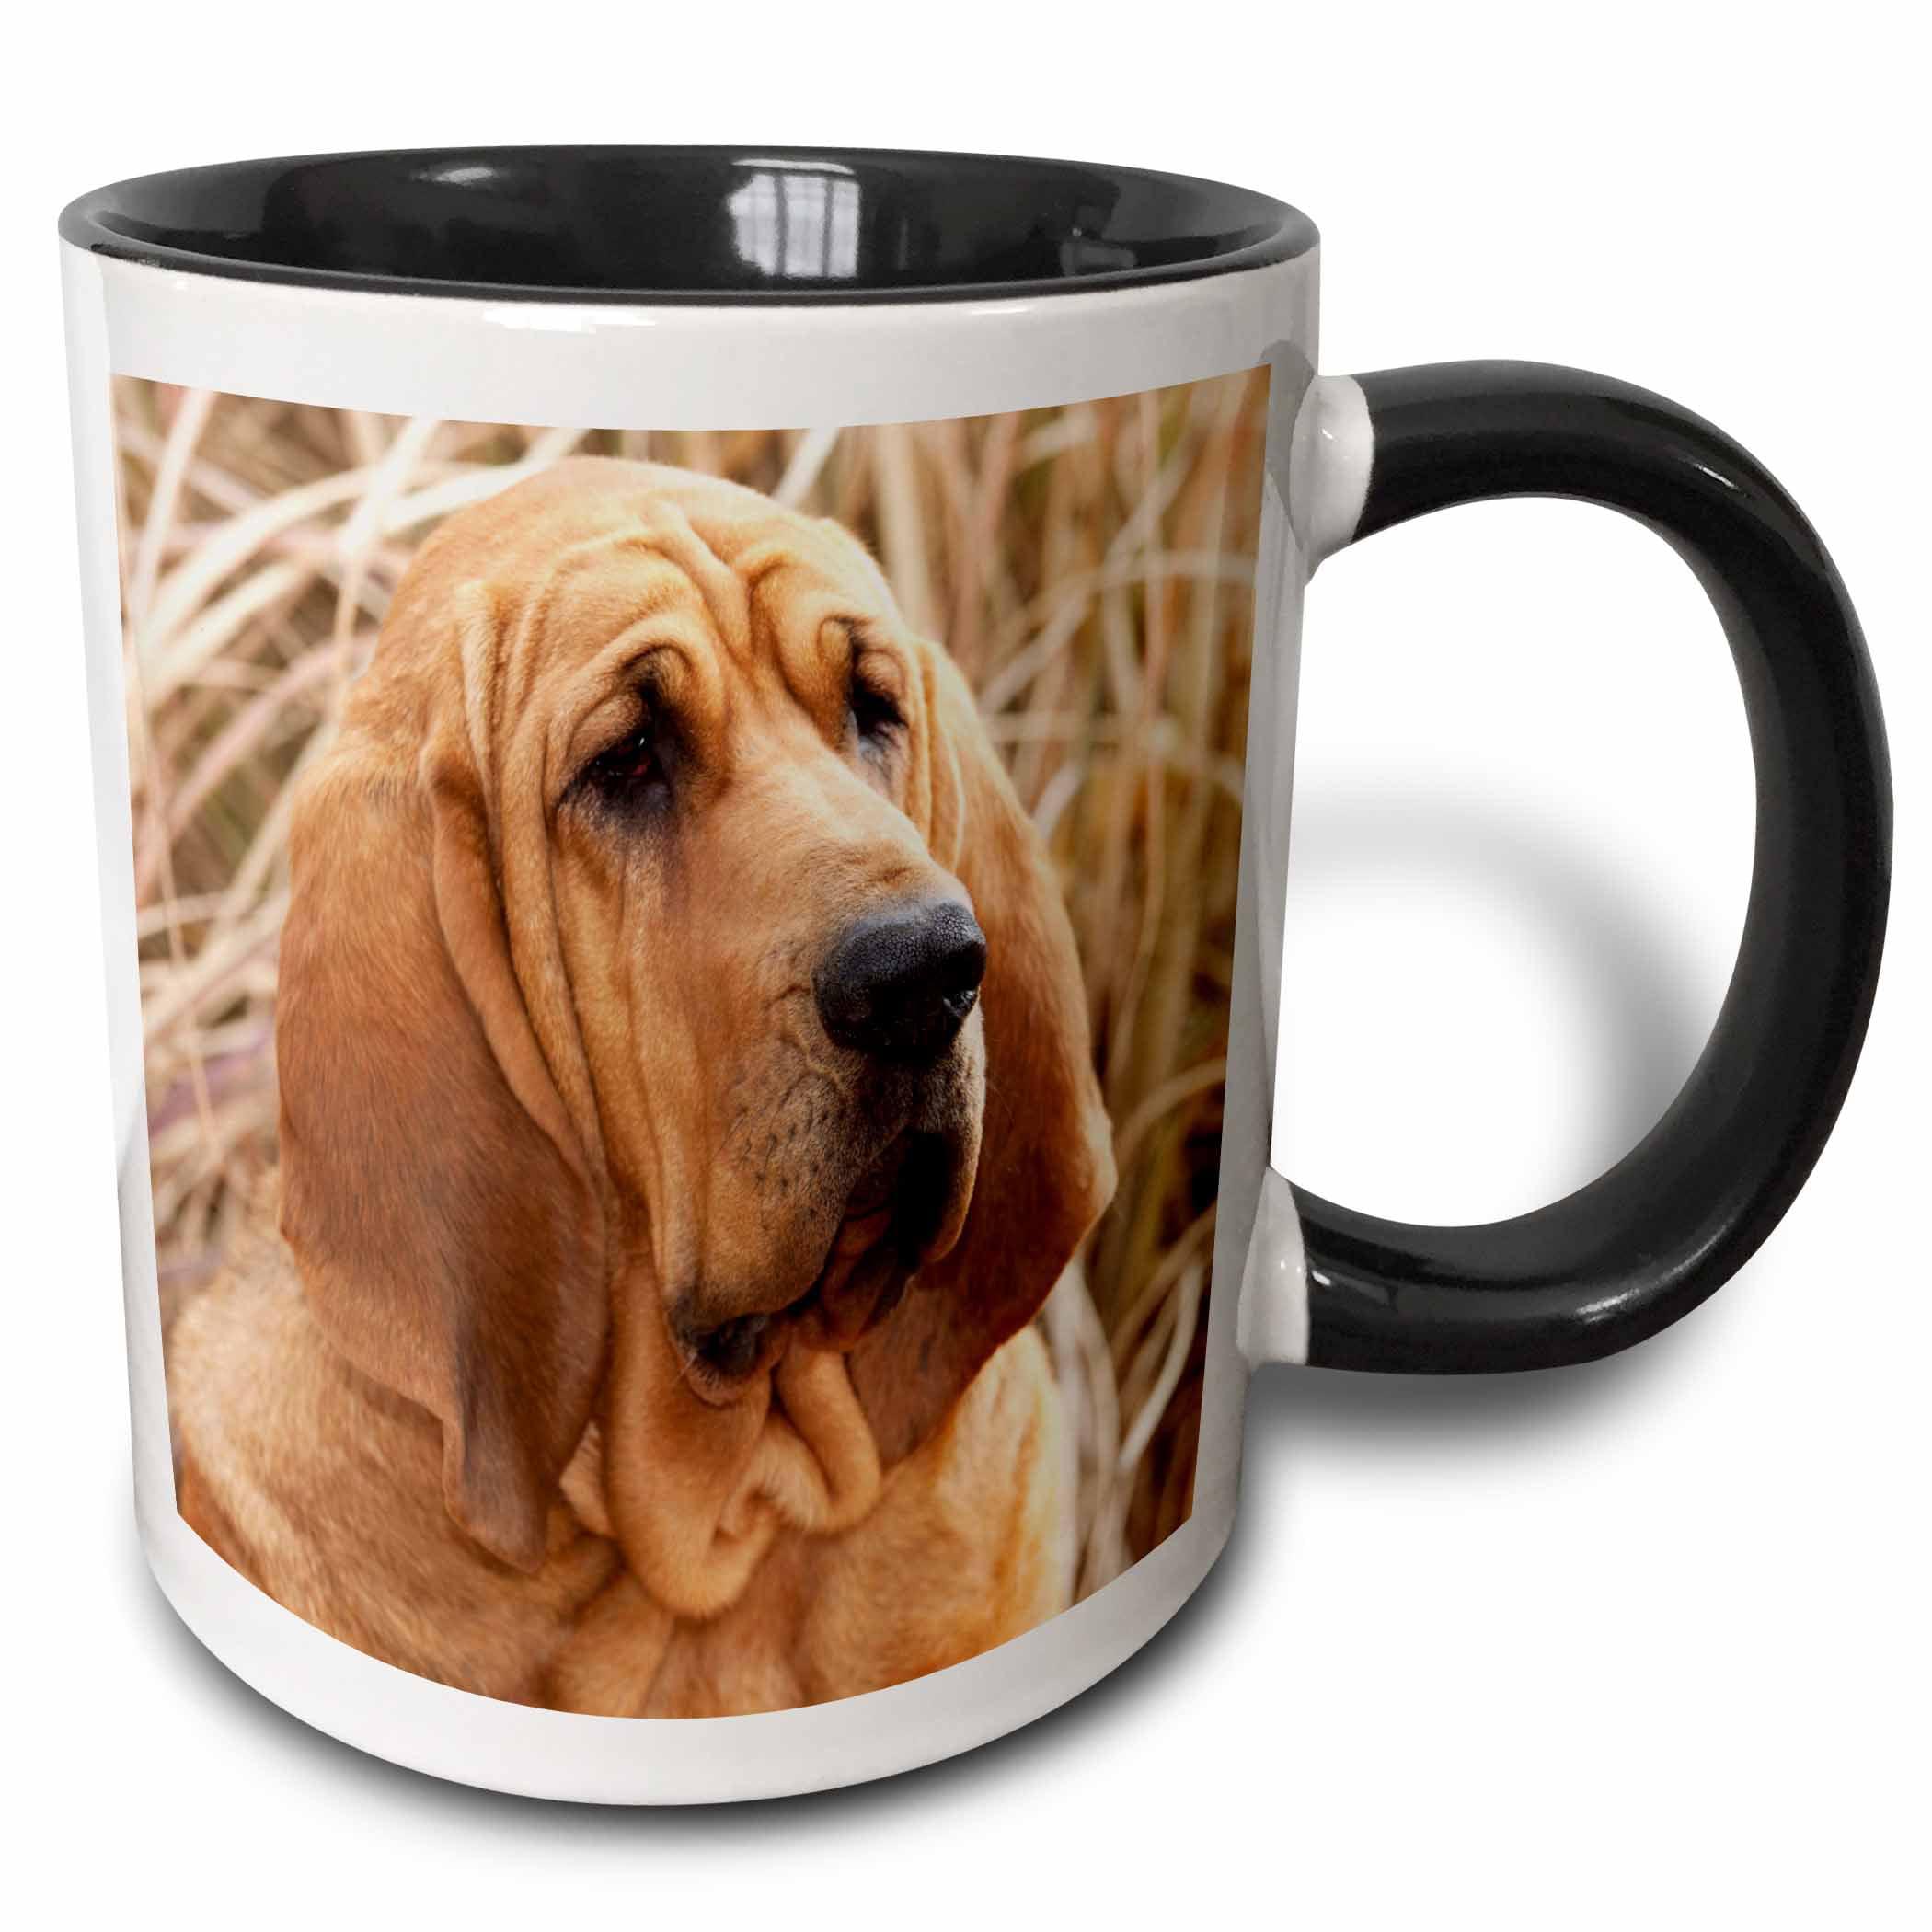 3dRose Purebred Bloodhound dog in dried grass - NA02 PWO0075 - PiperAnne Worcester, Two Tone Black Mug, 11oz